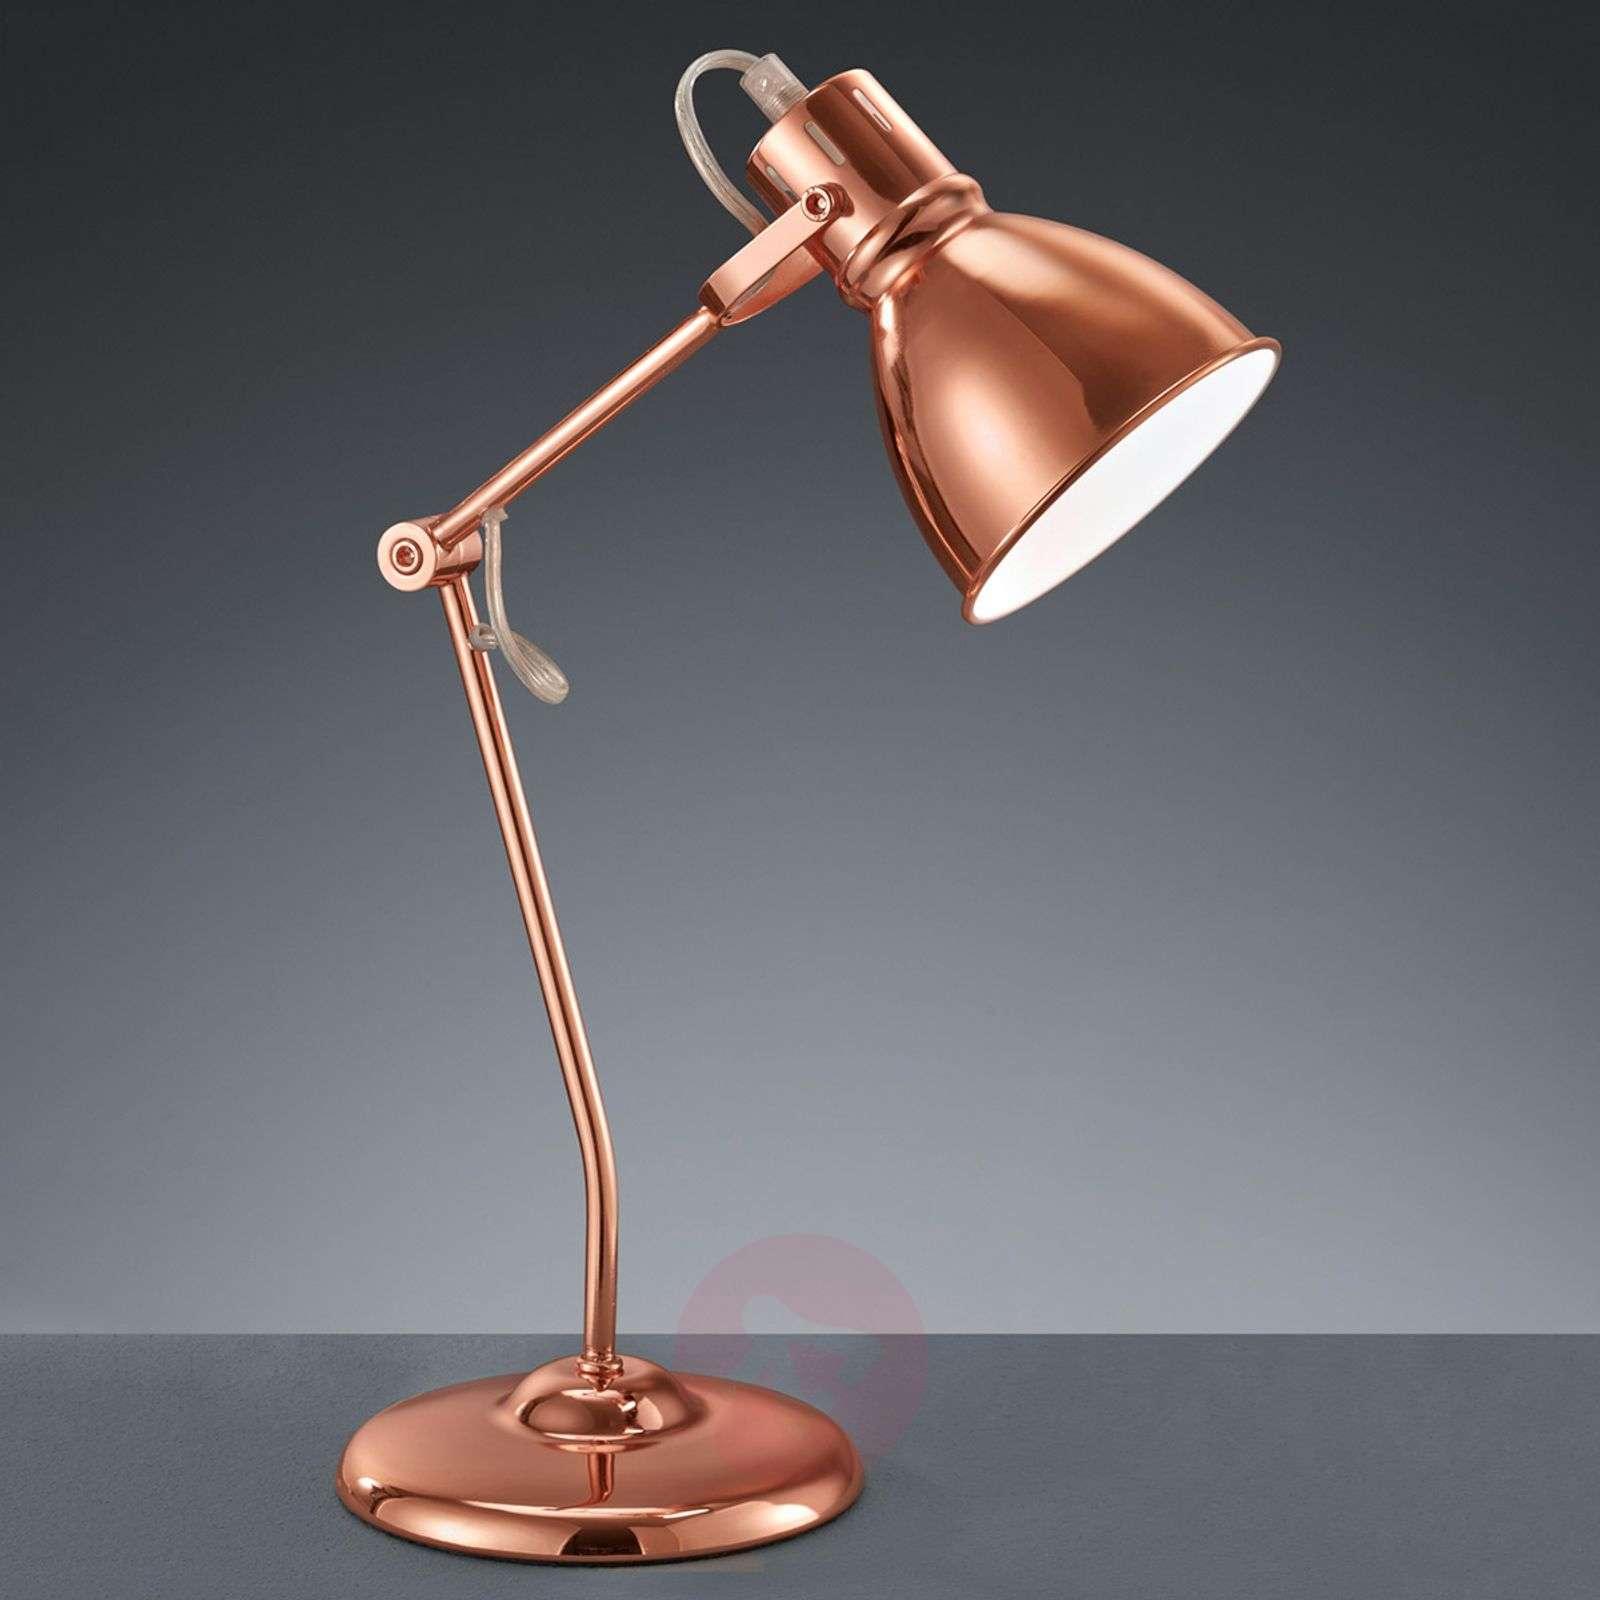 Keali table lamp, copper-9004962-01